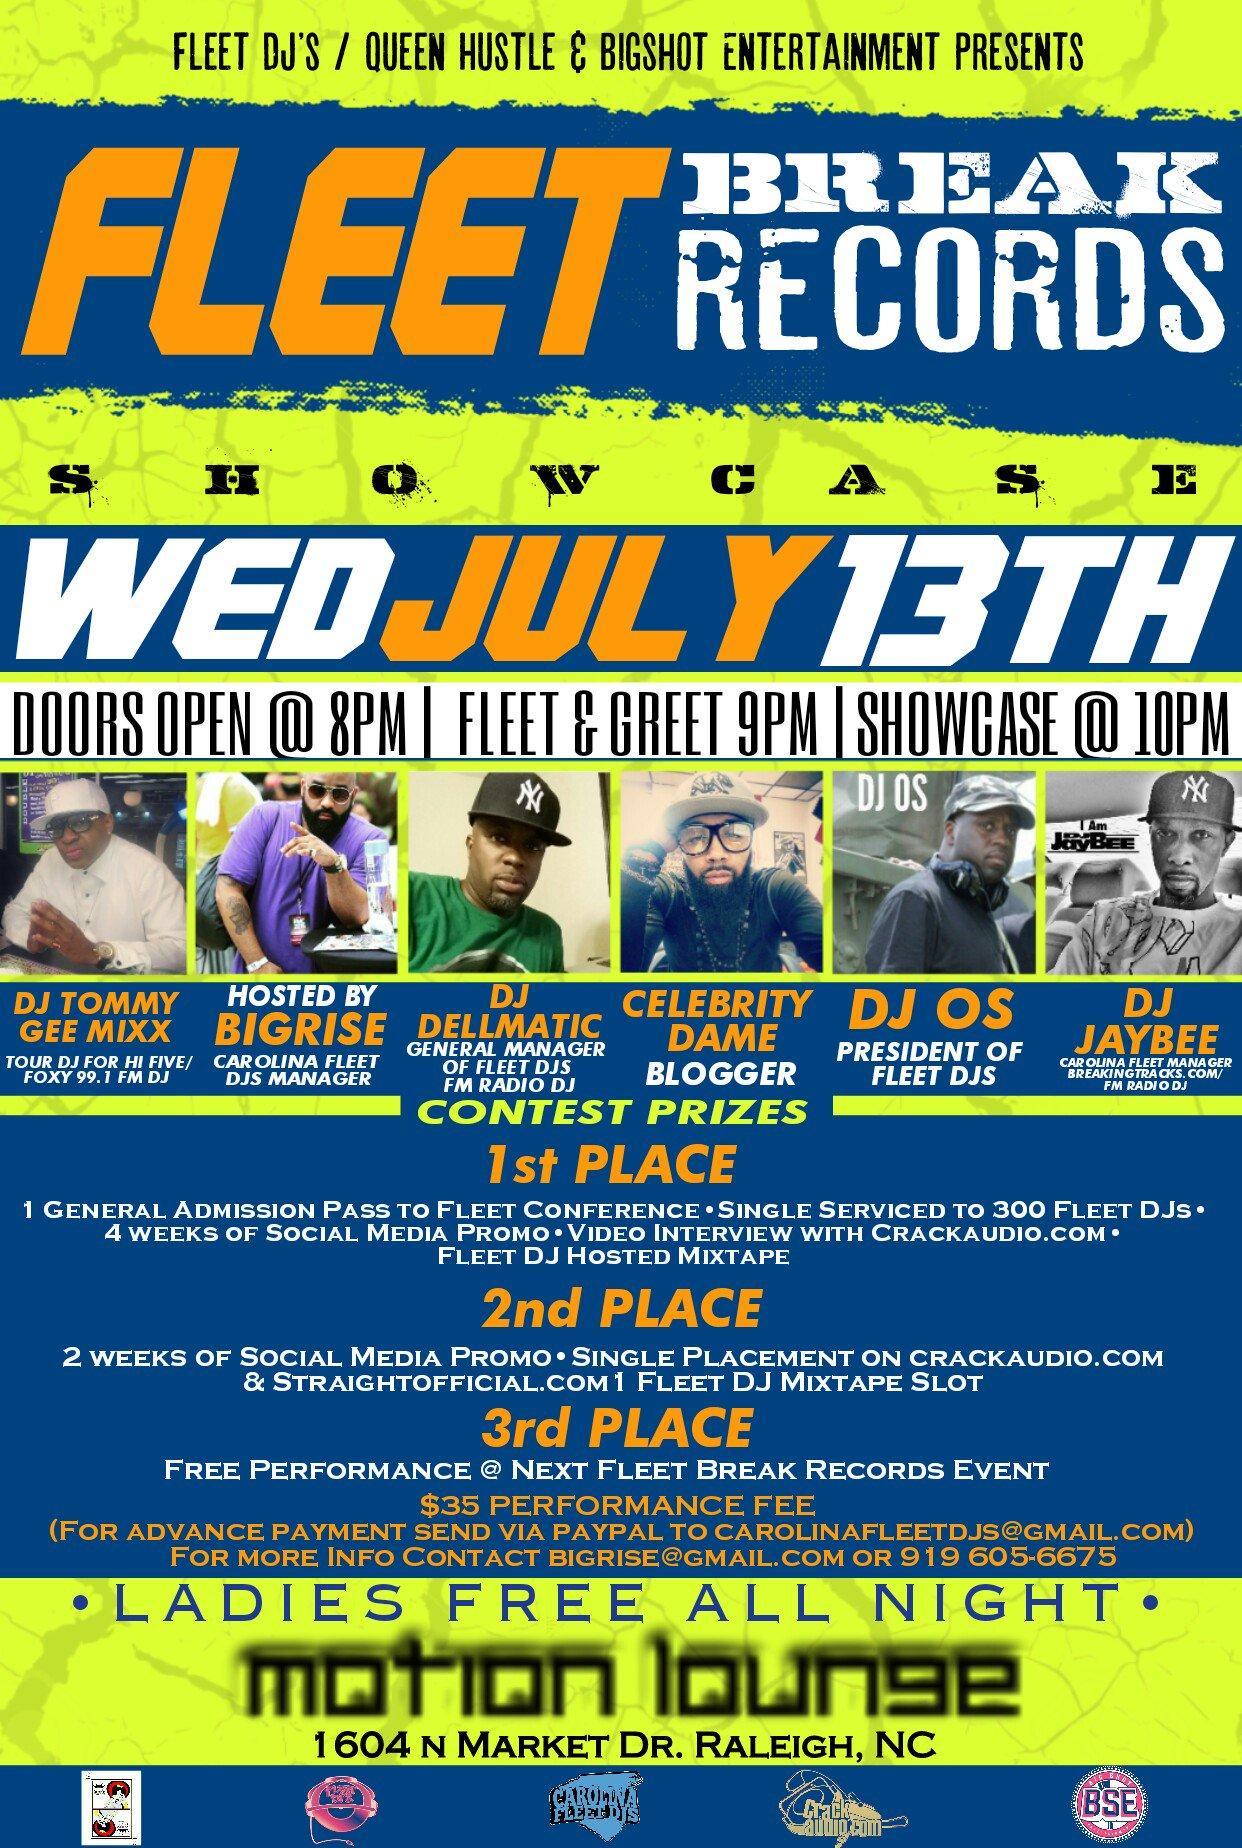 FLEET BREAK RECORDS SHOWCASE, BRING 5 PEOPLE TO WAVE PERFORMANCE FEE @Bigrise @DJDELLMATIC @DJOS100 @TommyGeeMixx https://t.co/qTBlyhthQ5